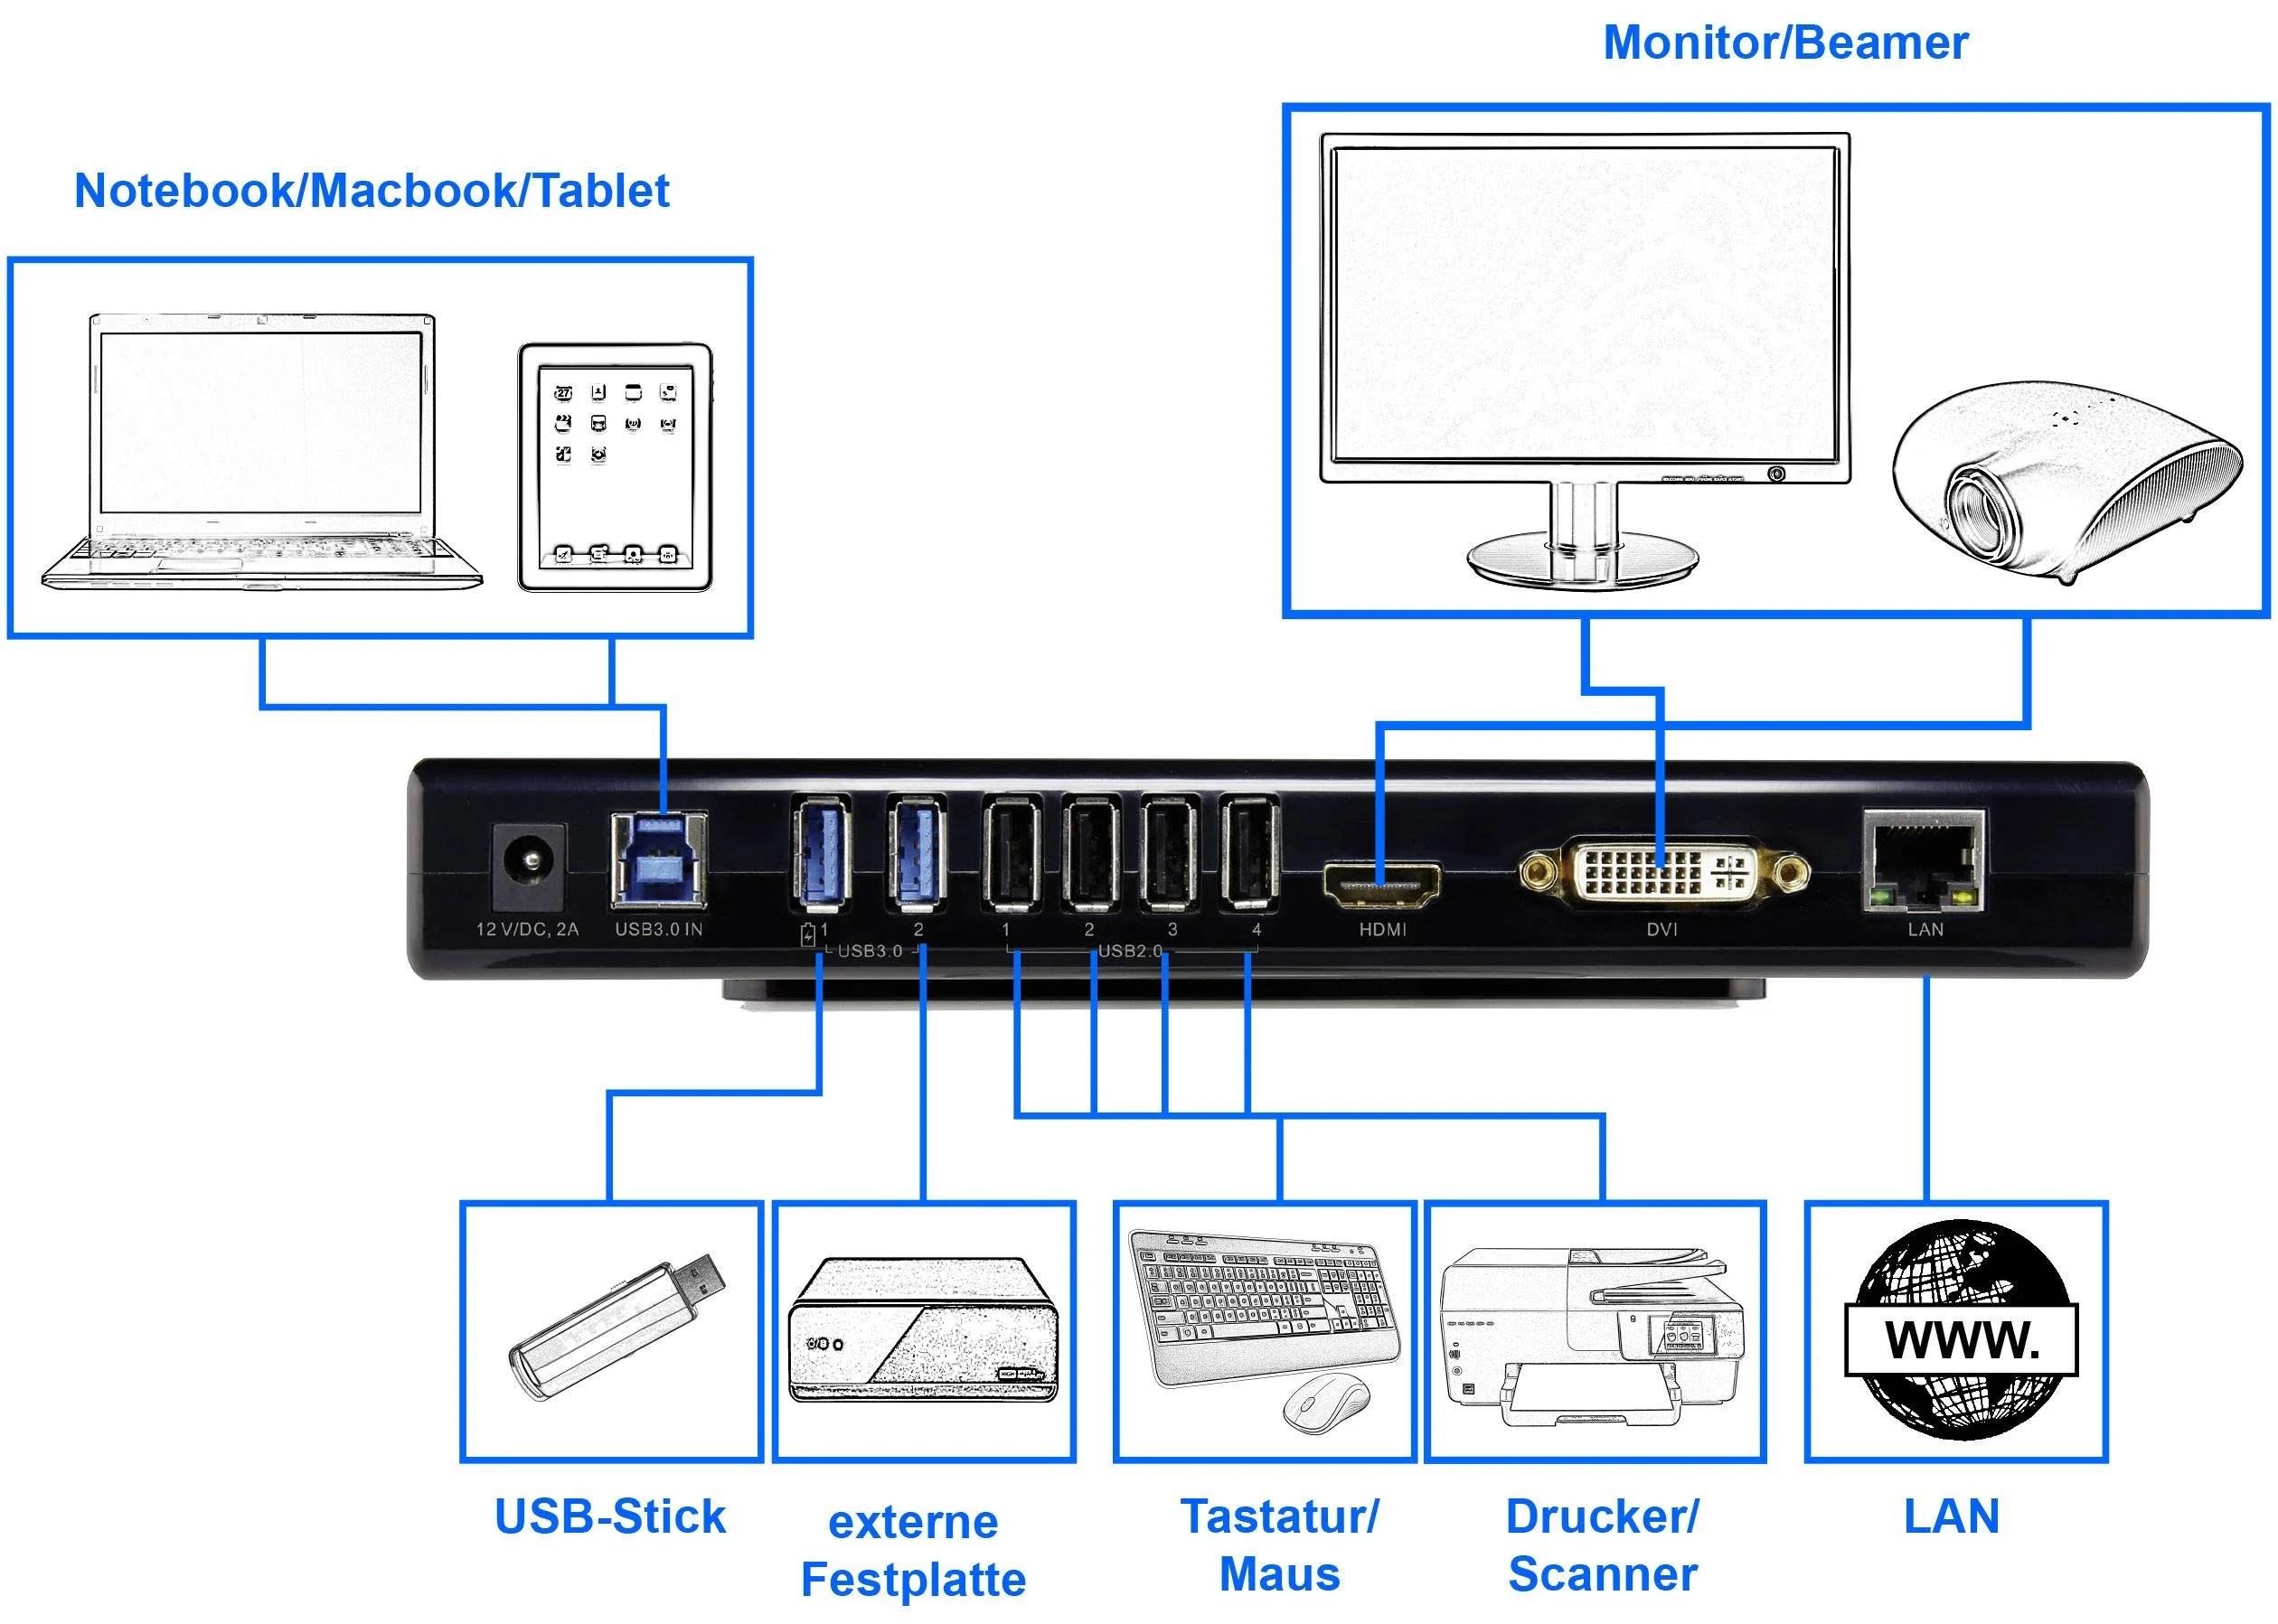 small resolution of renkforcelaptop docking stationuniversal 2x usb 3 0 4x usb 2 0 1x hdmi headphones 1x dvi 1x lan 10 100 1000 mbps